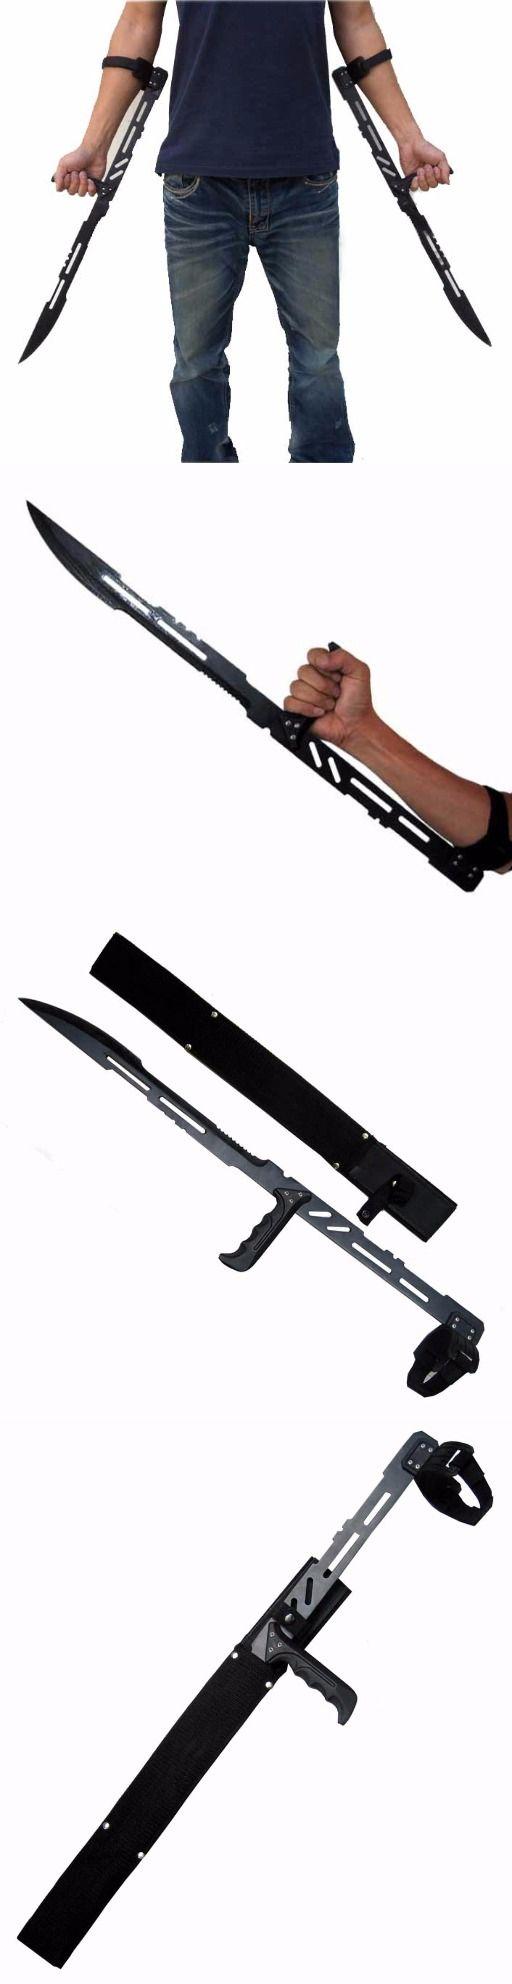 Ninja Forearm Blade Knife @thistookmymoney